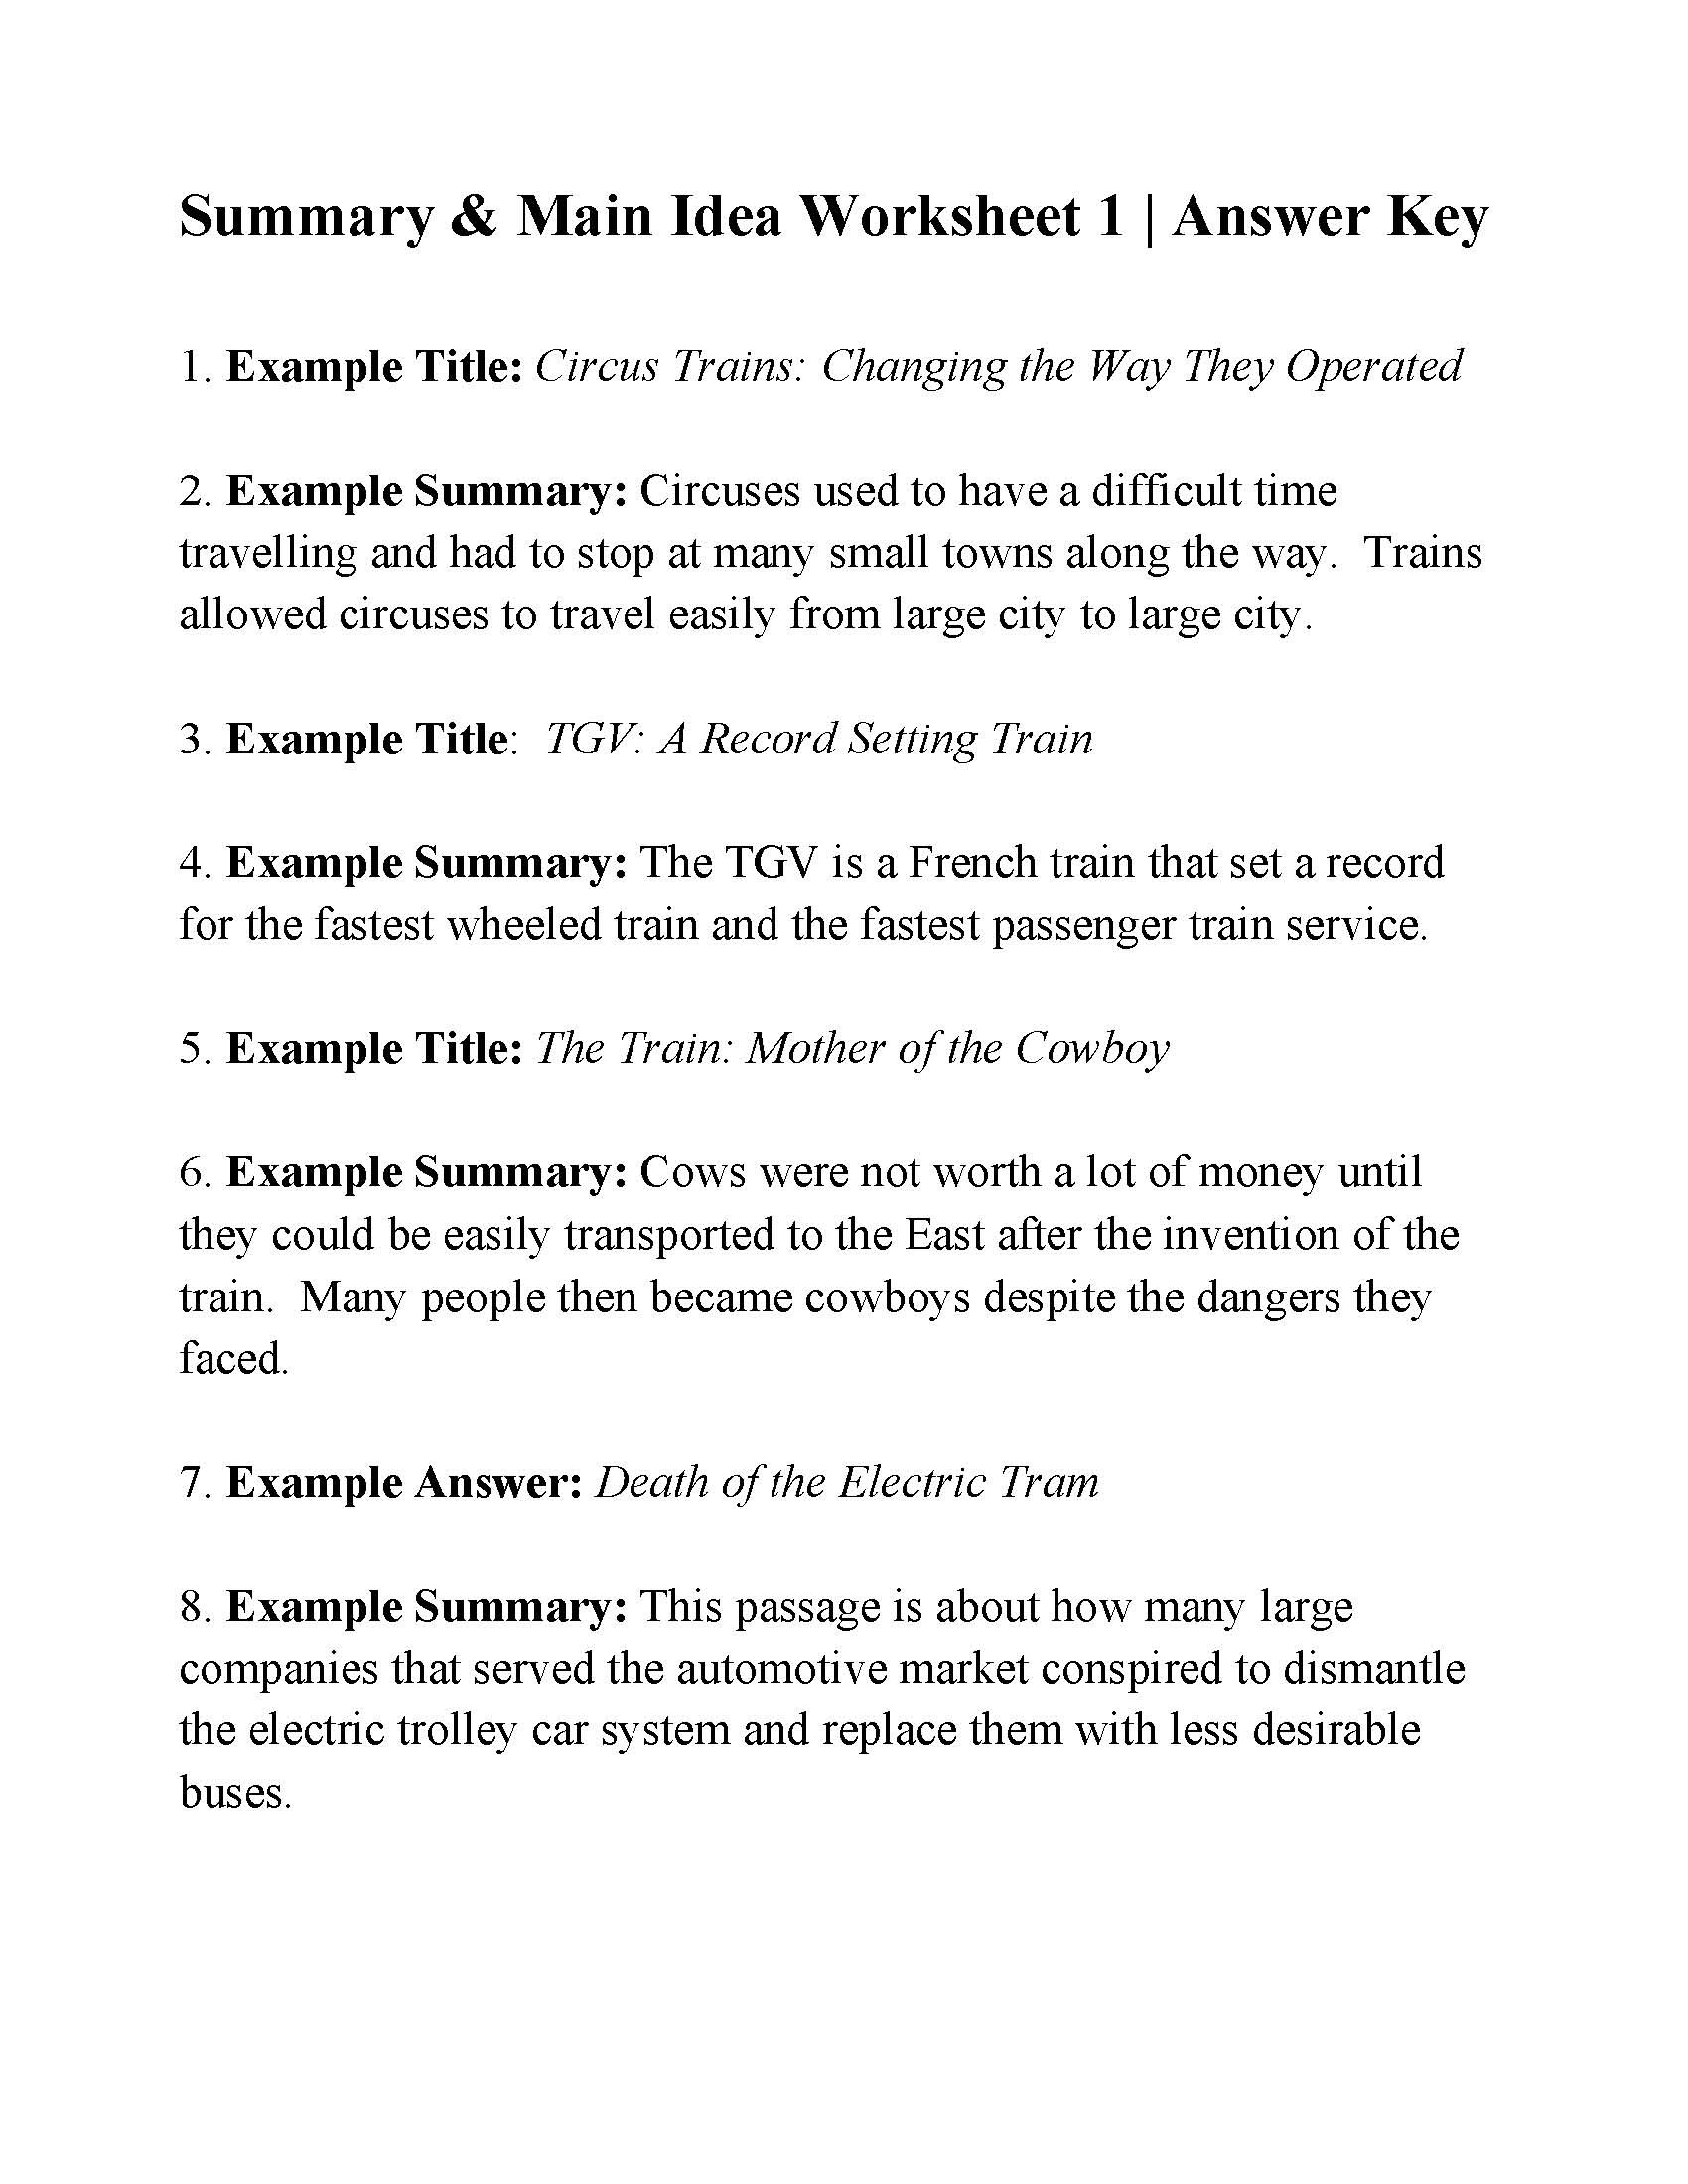 Summarizing Worksheet 4th Grade Summary and Main Idea Worksheet 1